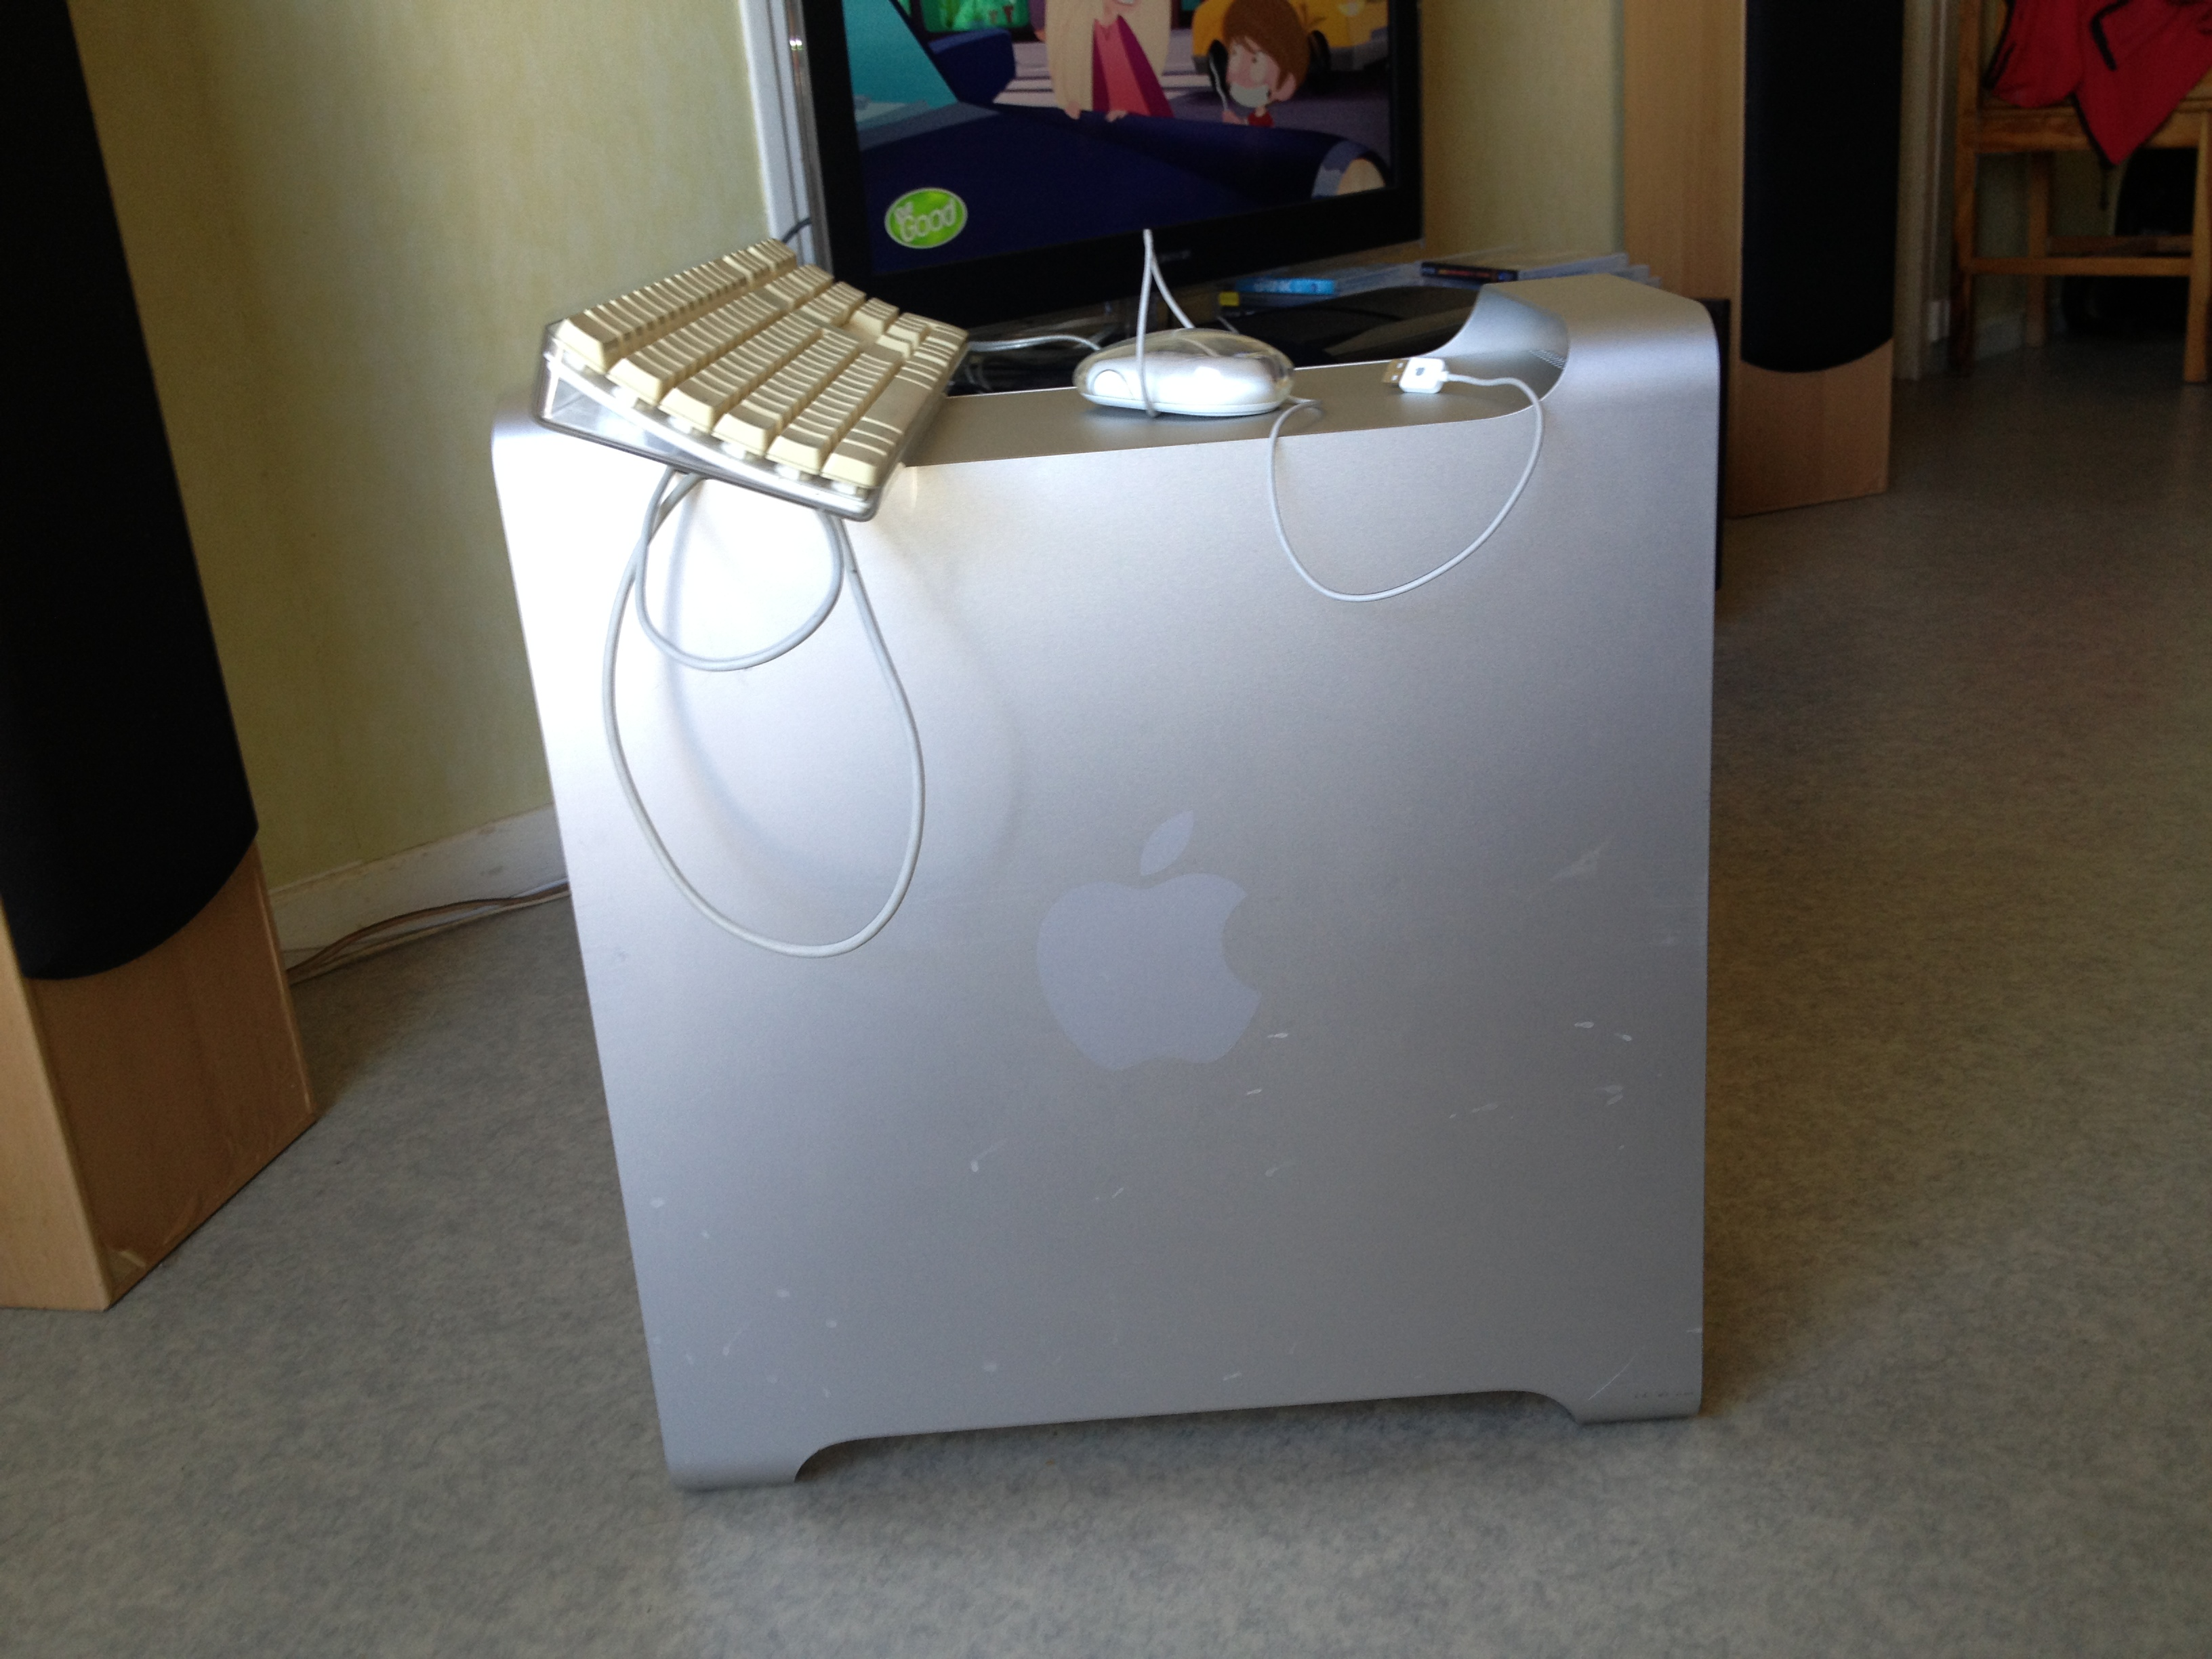 Pictures and images Apple PC POWER MAC G5 10 5 8 2GO RAM - Audiofanzine